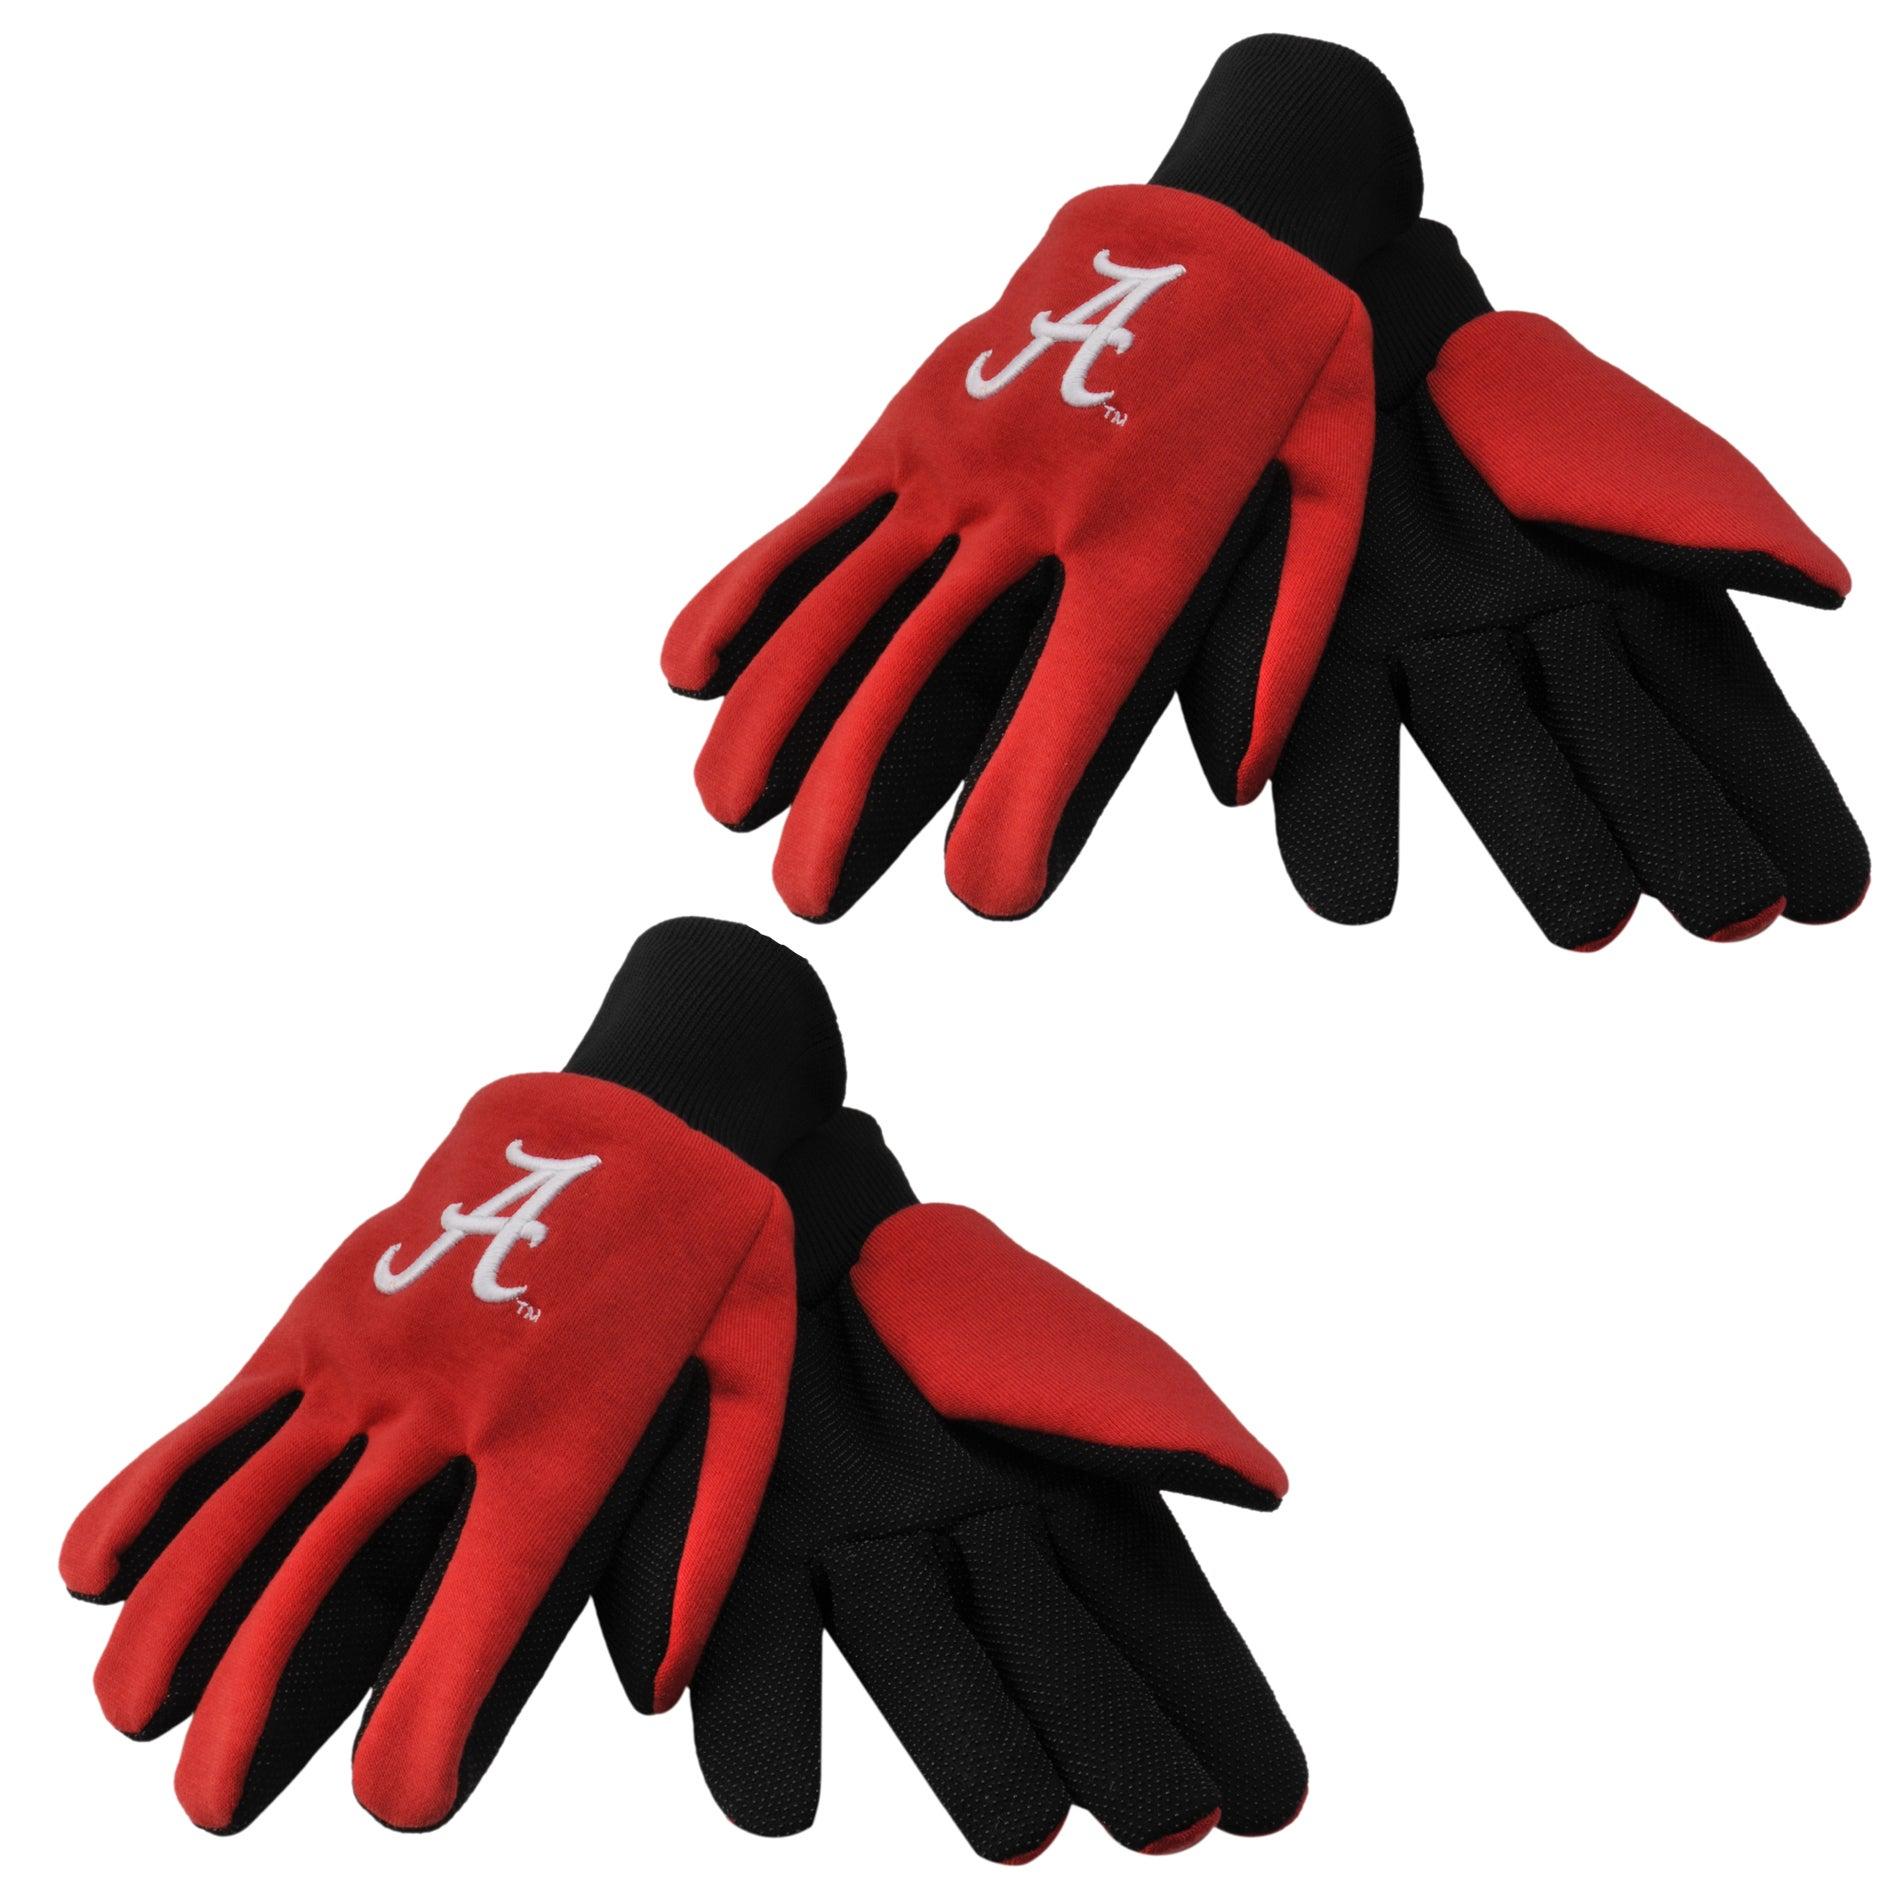 Alabama Crimson Tide Two-tone Gloves (Set of 2 Pair)